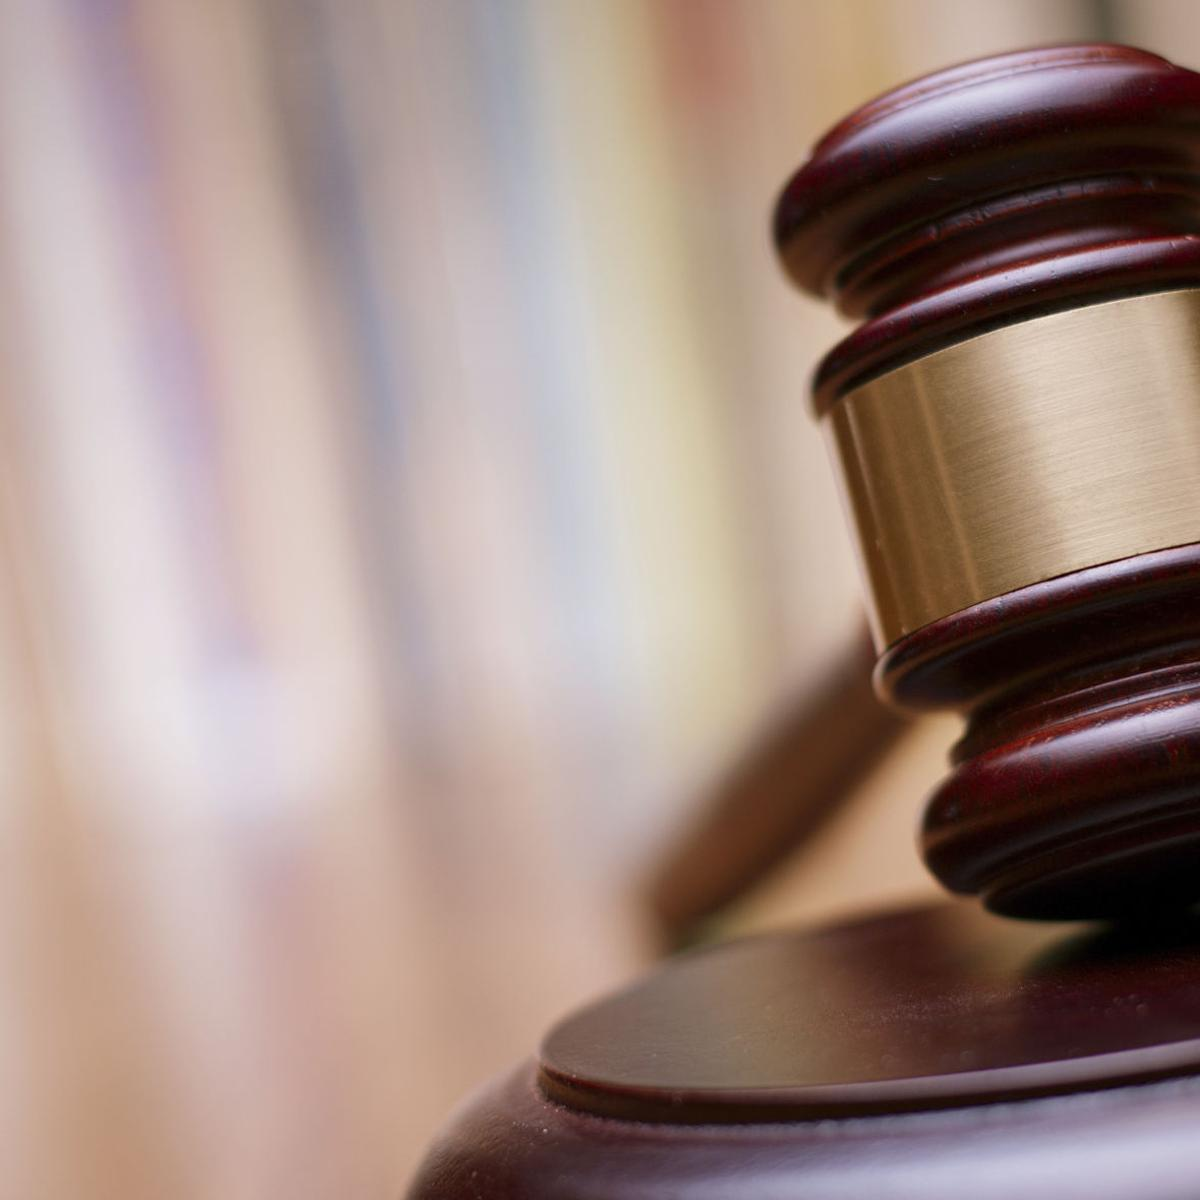 Bourbonnais homebuilder pleads guilty to federal bank fraud